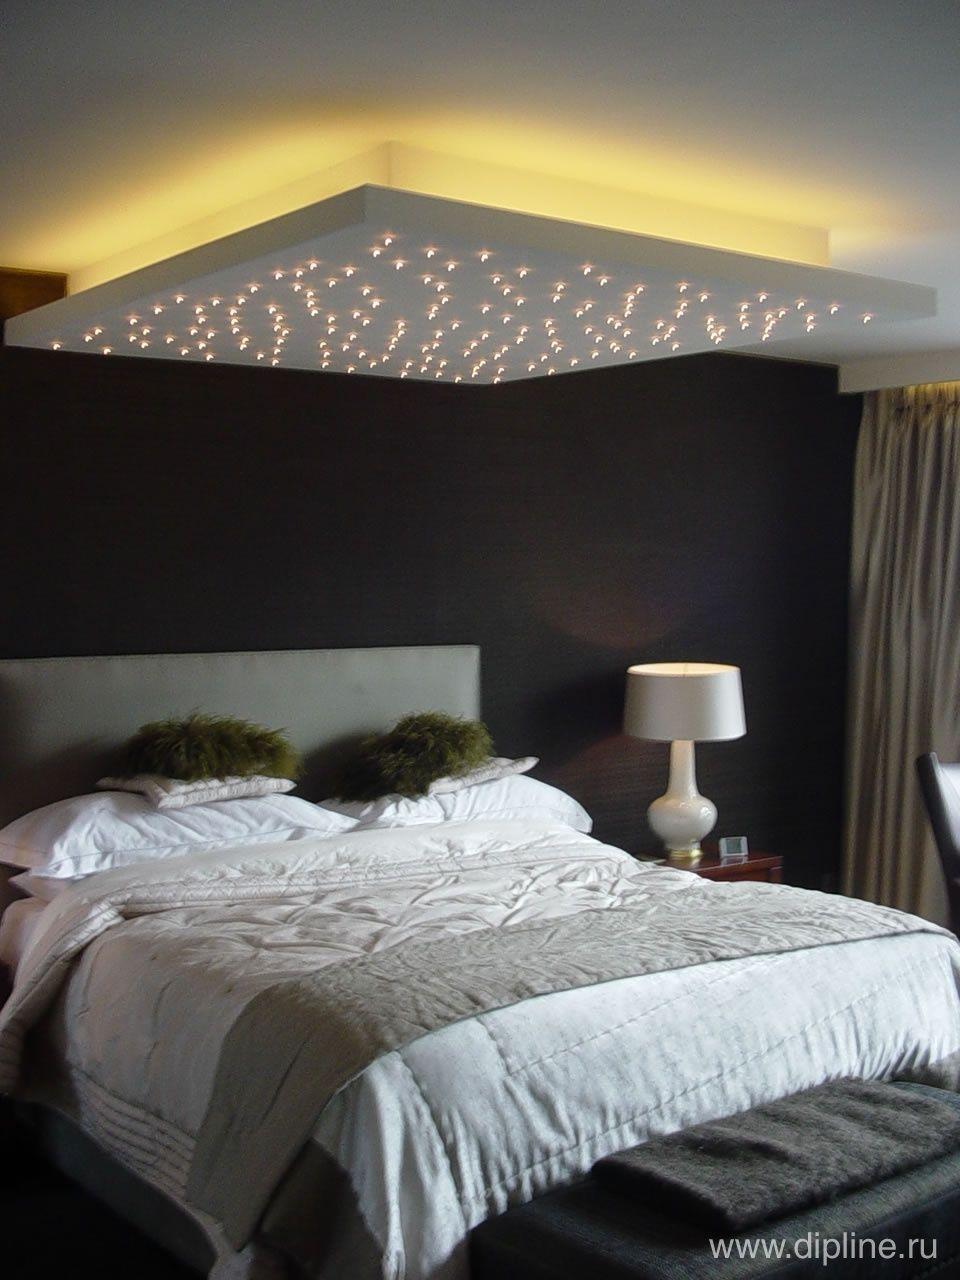 Great Bedroom Lighting False Ceiling In 2019 Bedroom In 2020 Ceiling Design Bedroom Bedroom Pop Design Ceiling Design Modern